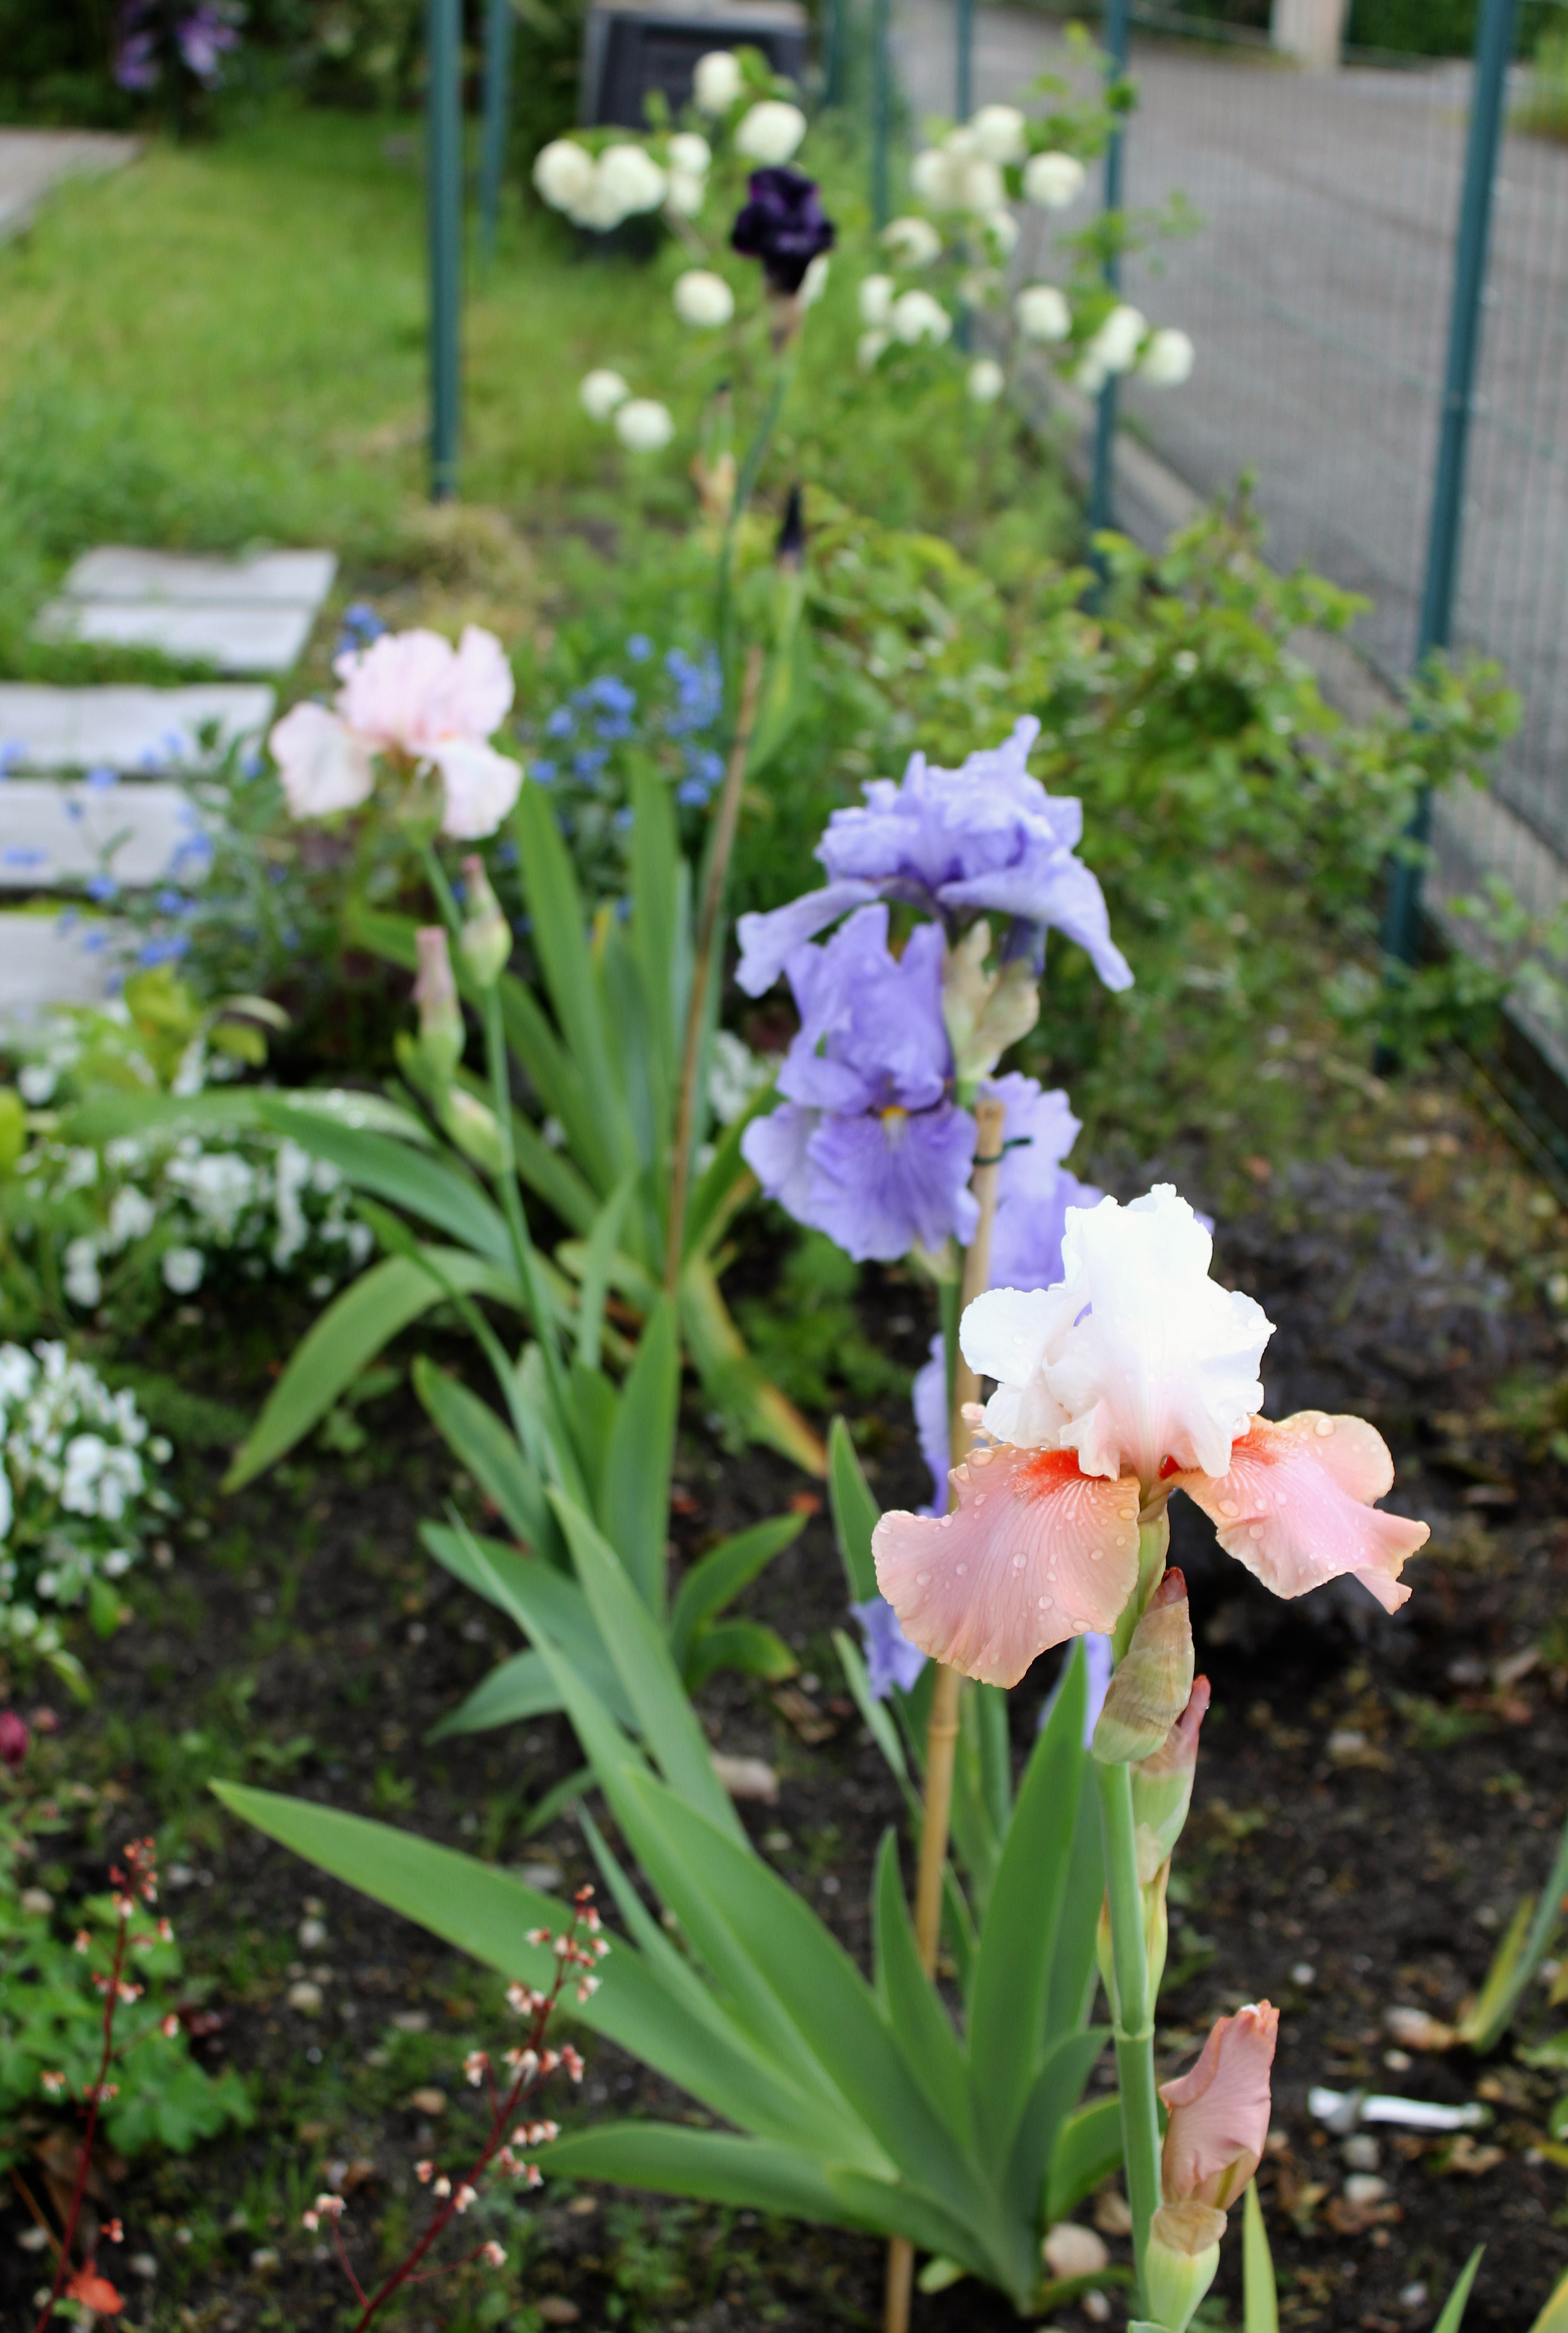 Iris 'Sugar Magnolia' d'Iris en Provence